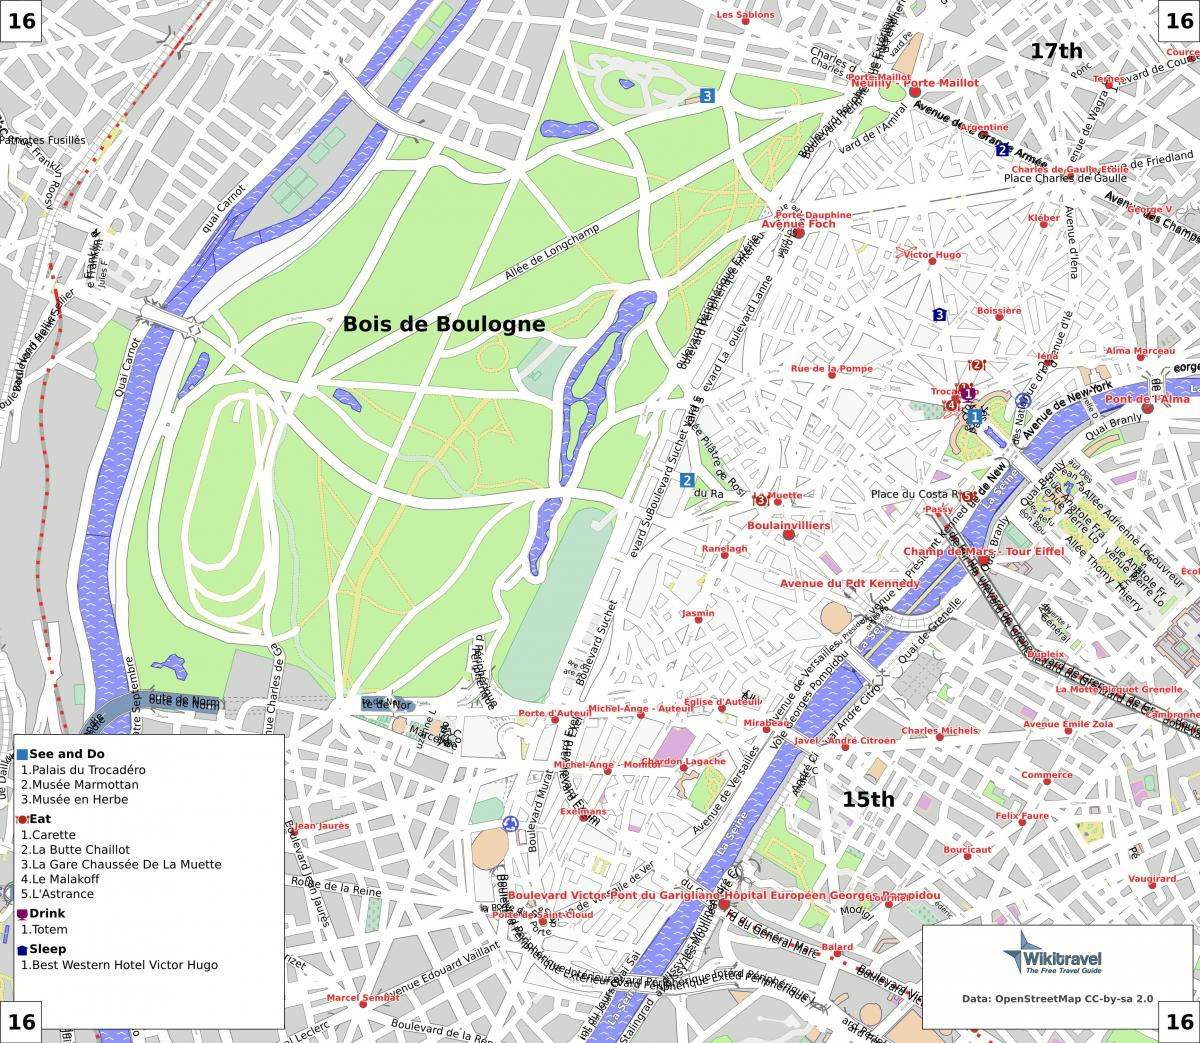 16 Arrondissement Parizs Terkep Terkep 16 Arrondissement Parizs